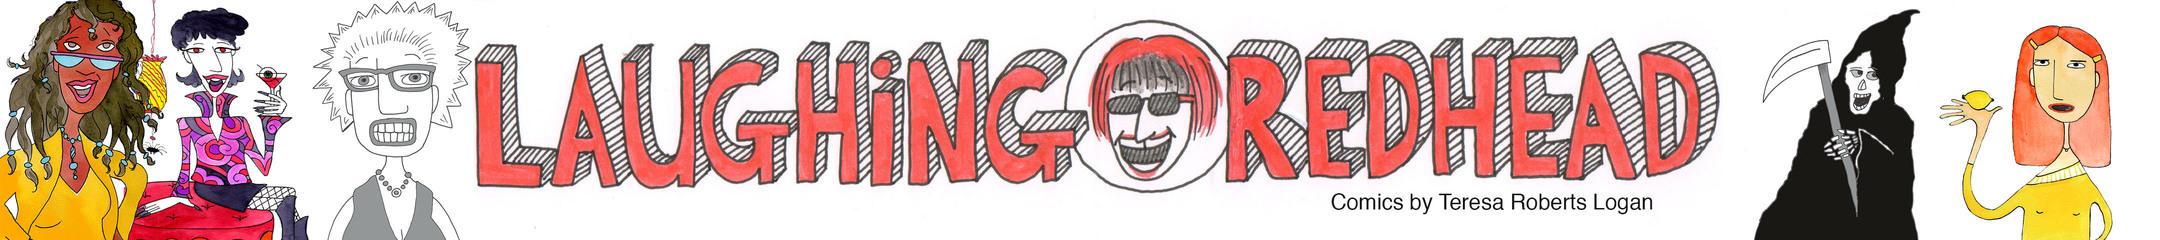 Laughing Redhead Comics